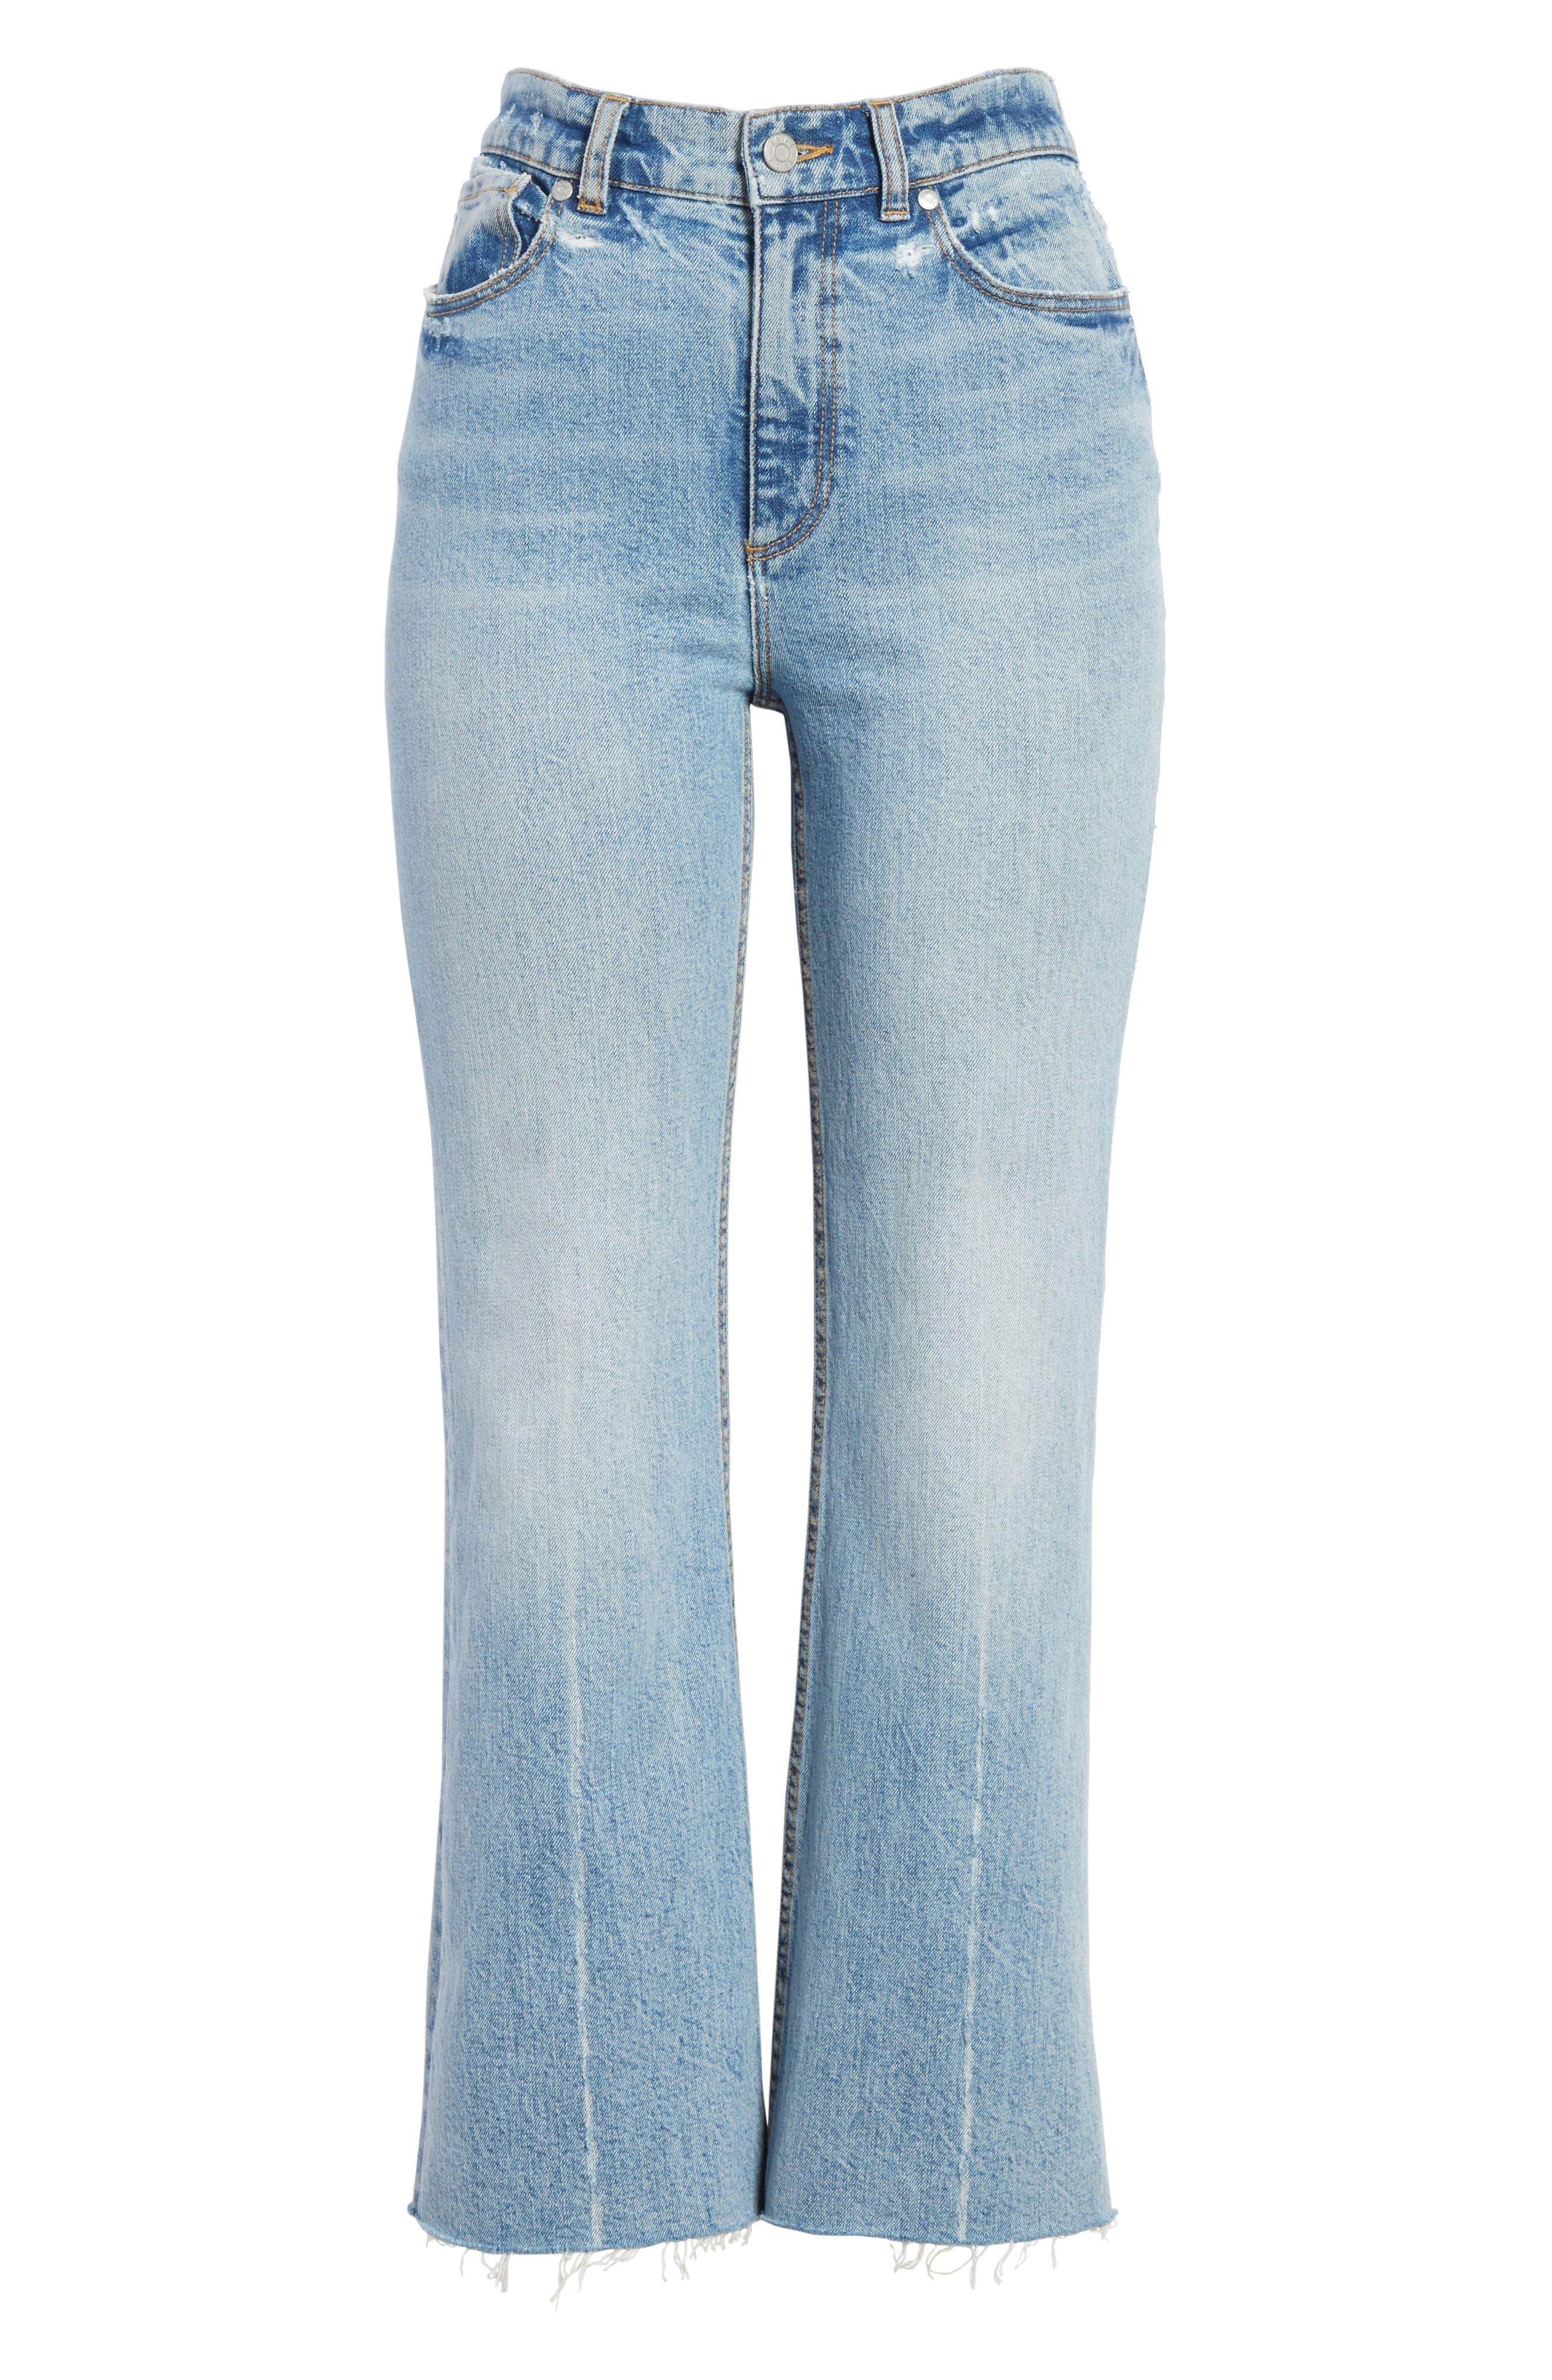 Ines Kick Bootcut Jeans,                             Alternate thumbnail 7, color,                             LEFT BANK WASH